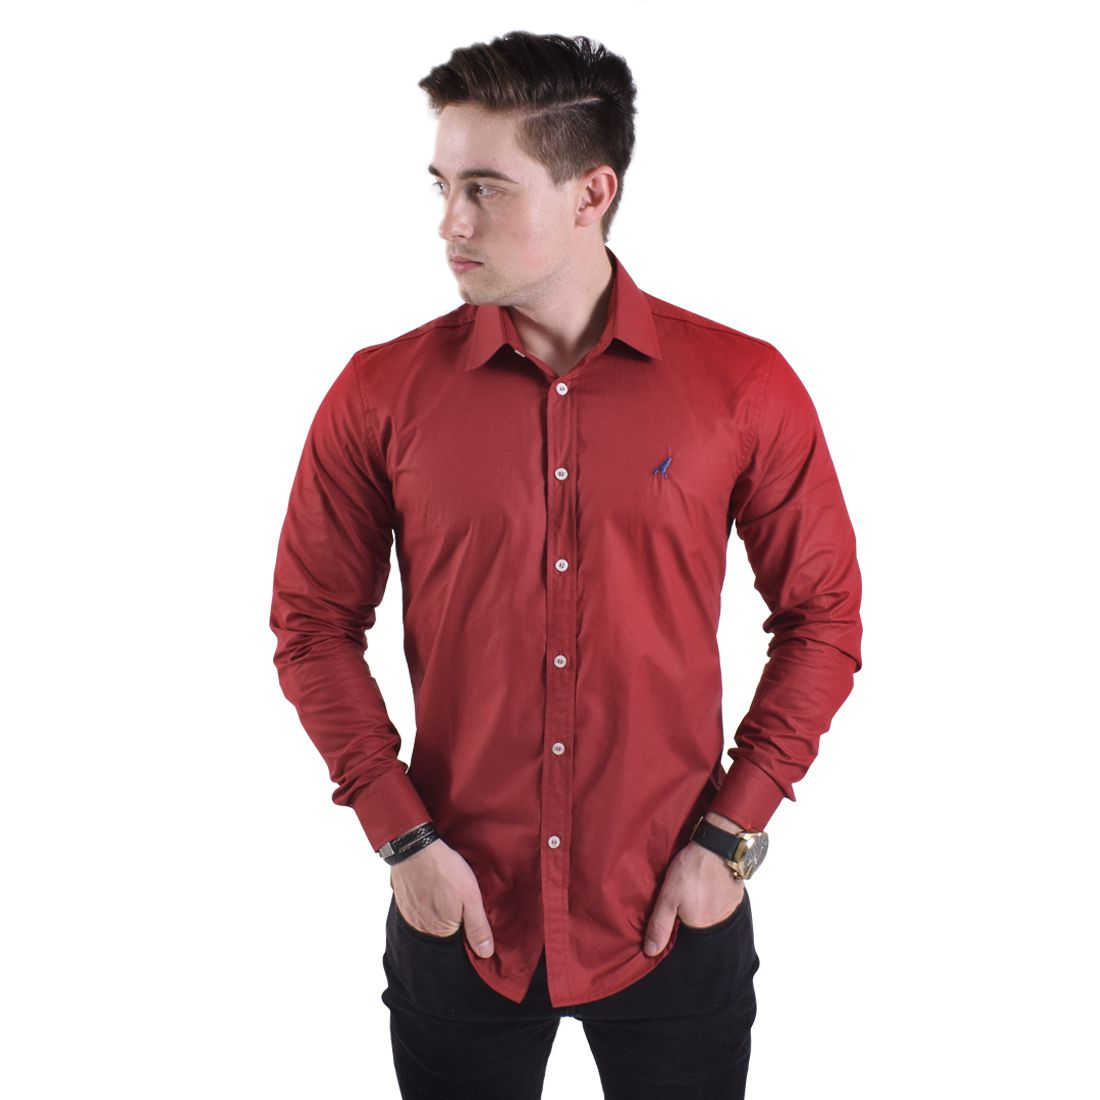 Camisa Social Vermelha Masculina